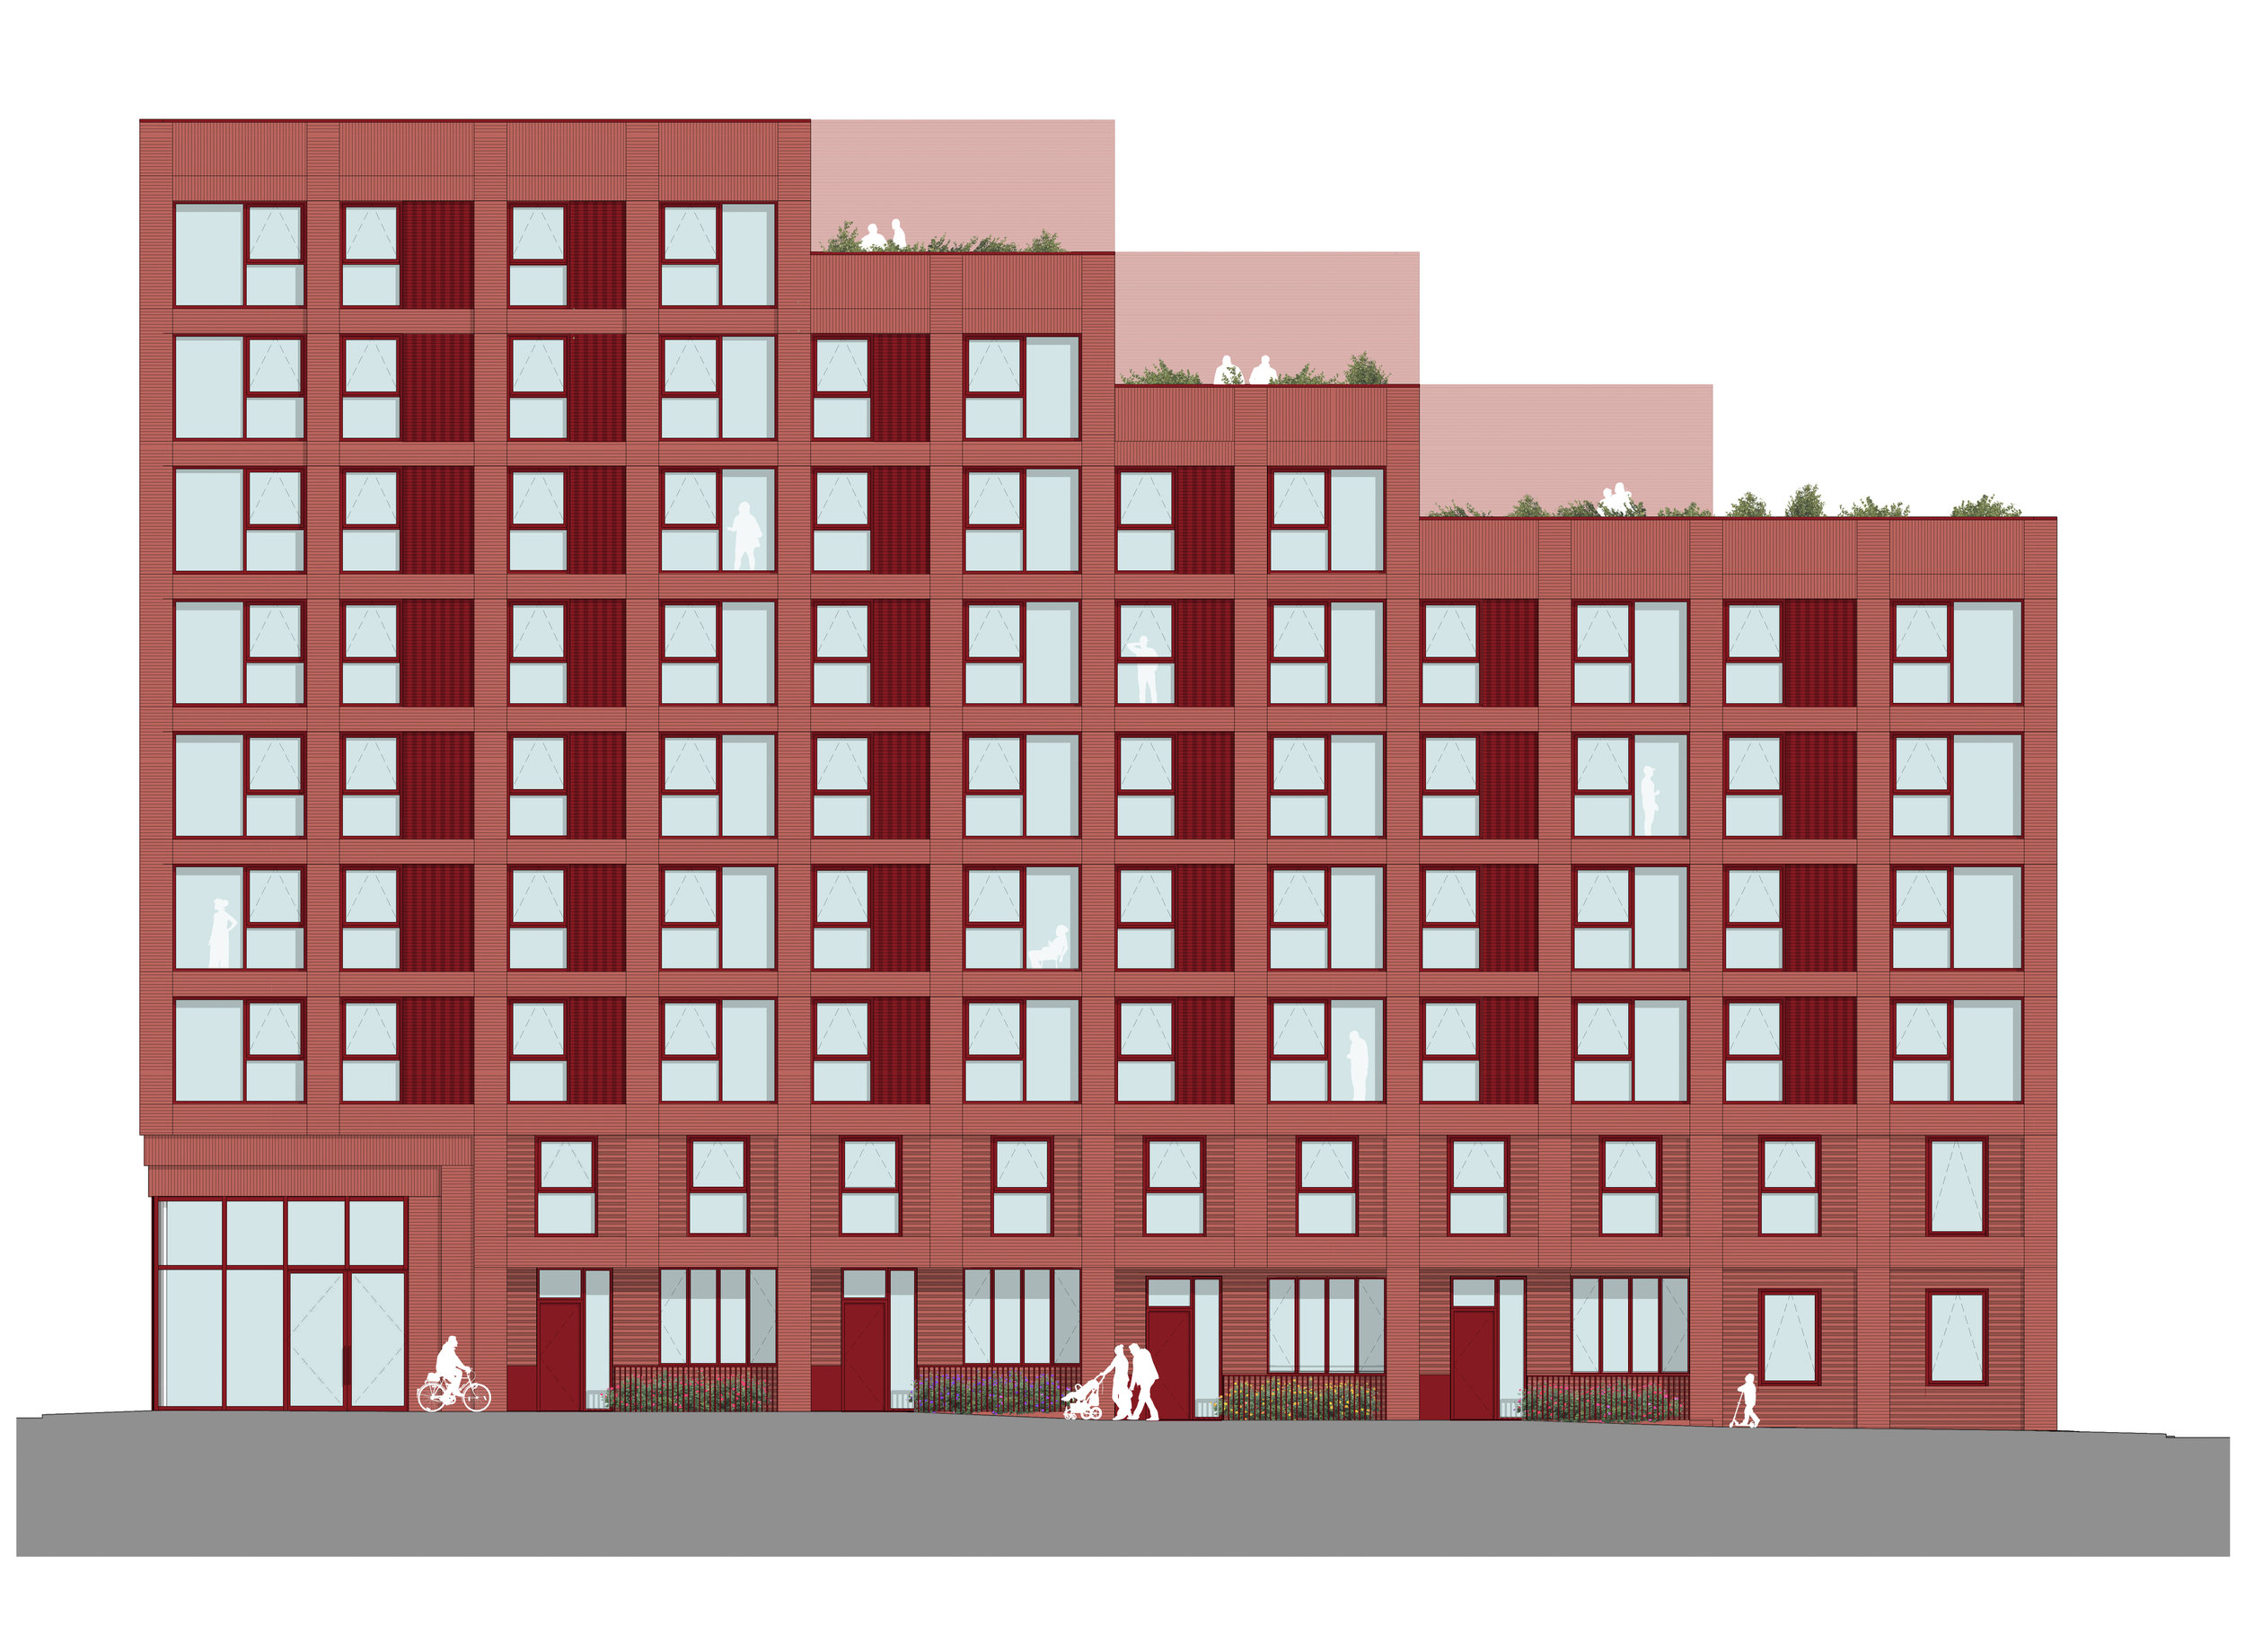 Addington Street elevation.